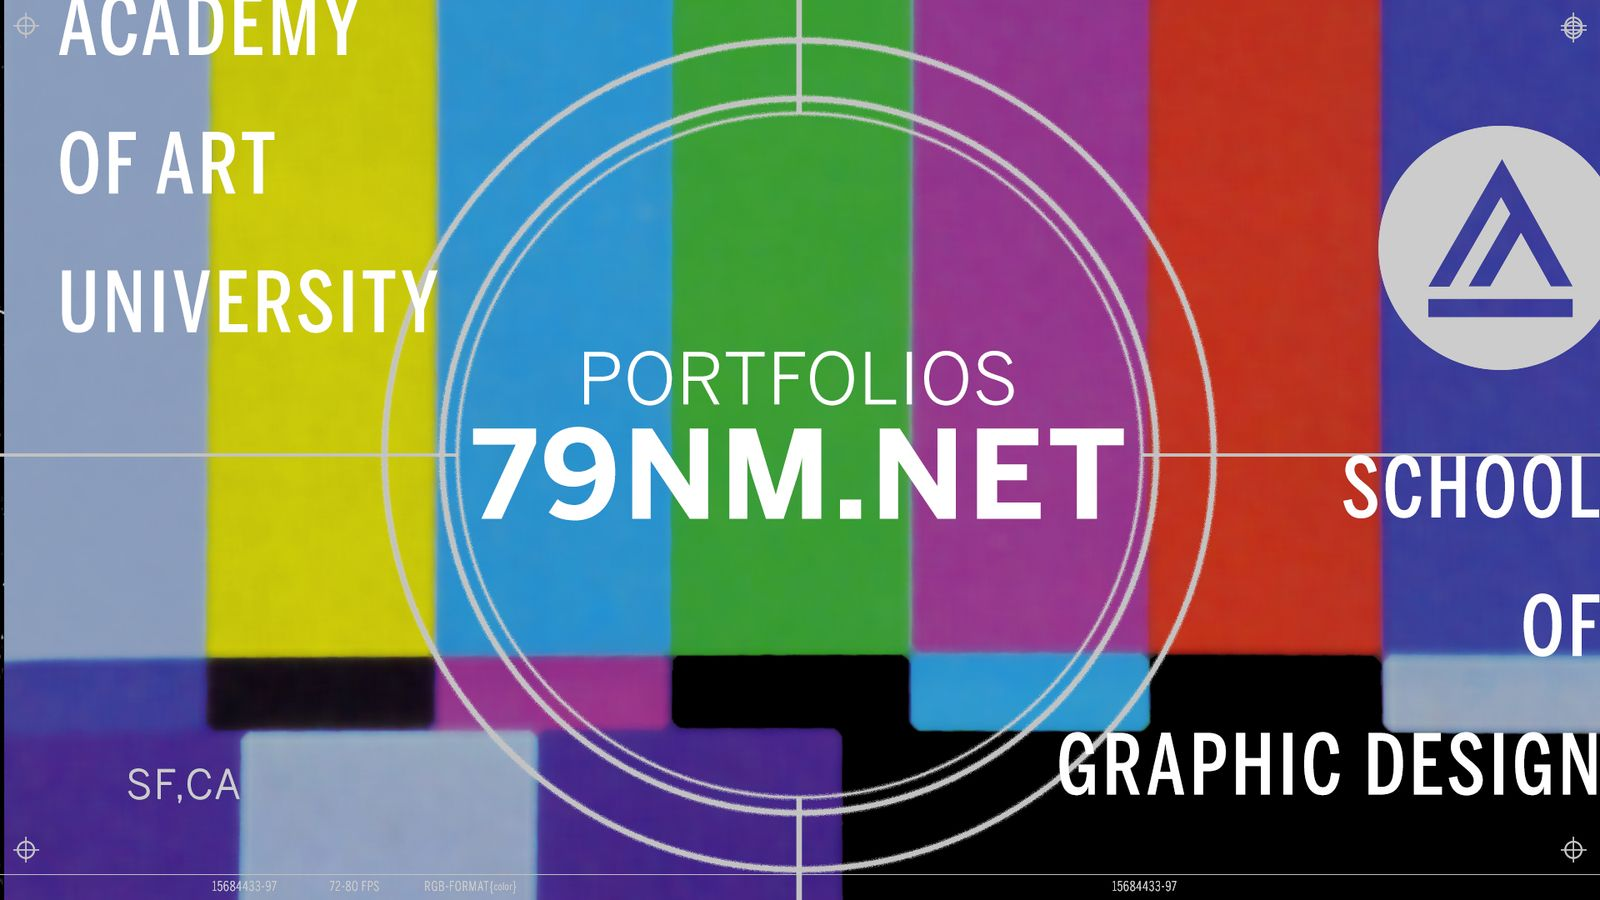 School of Graphic Design portfolio students living the #zoomlife